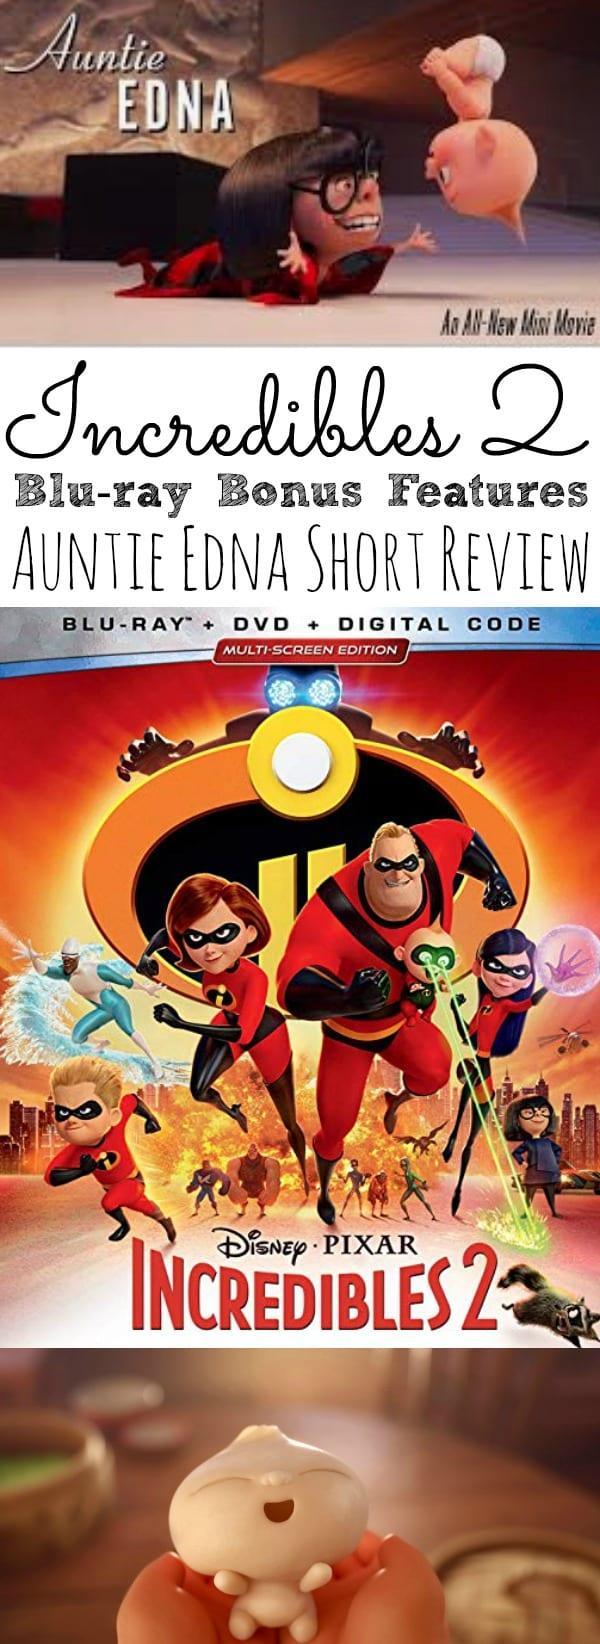 Incredibles 2 BluRay Bonus Features